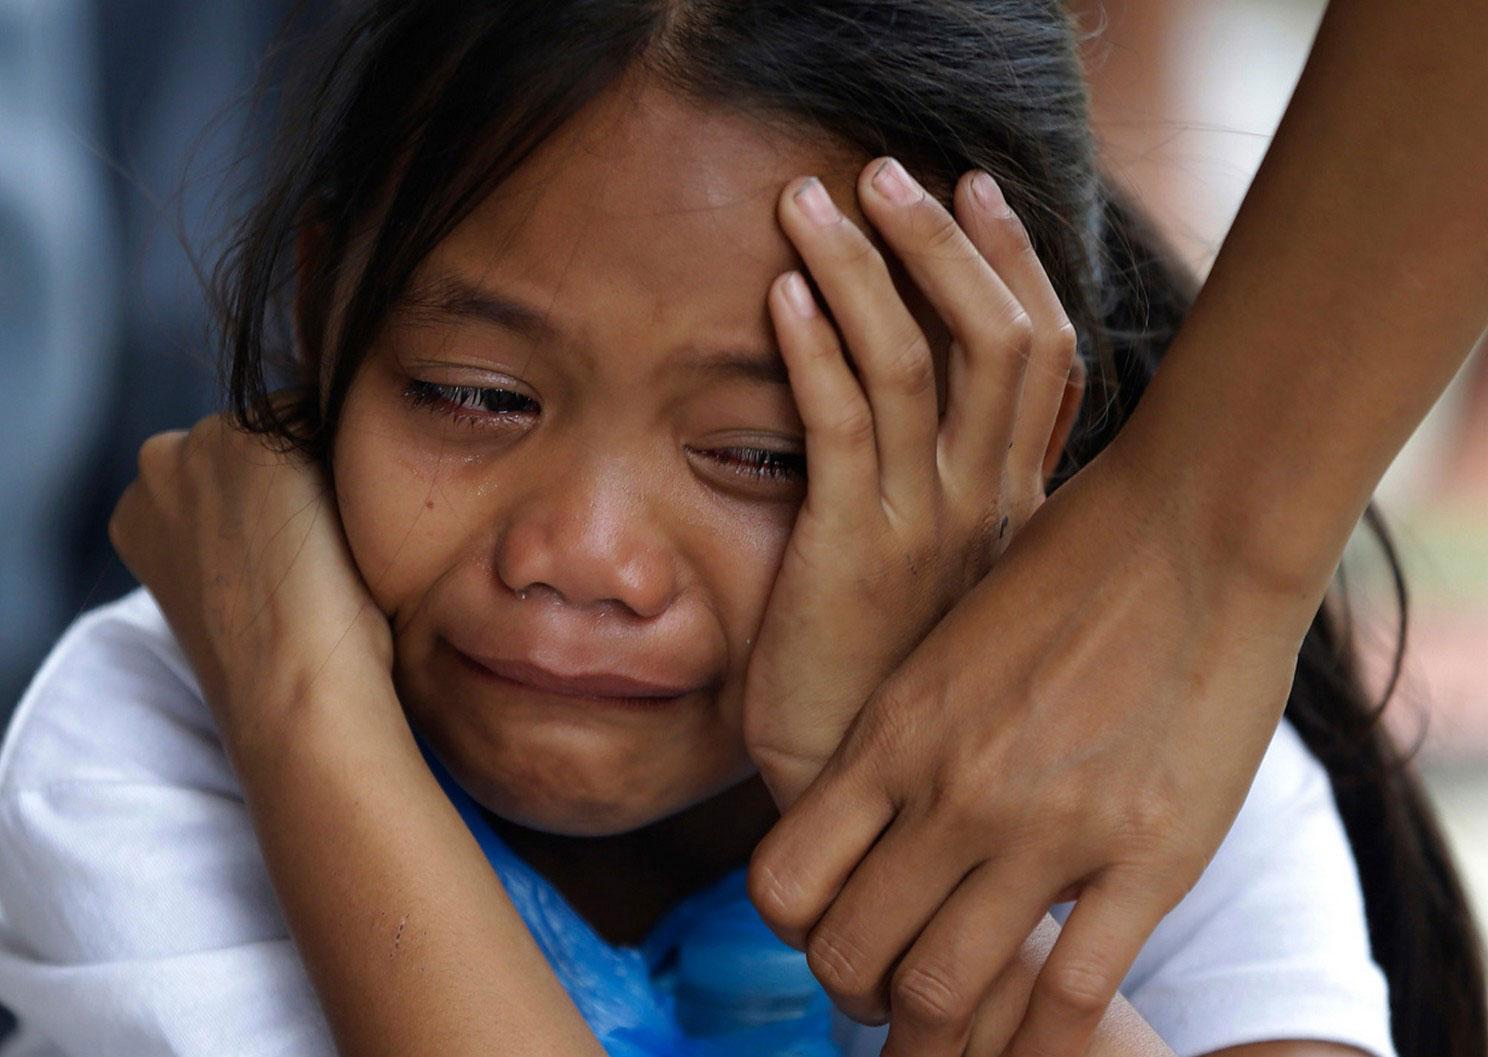 плач ребенка на похоронах, фото